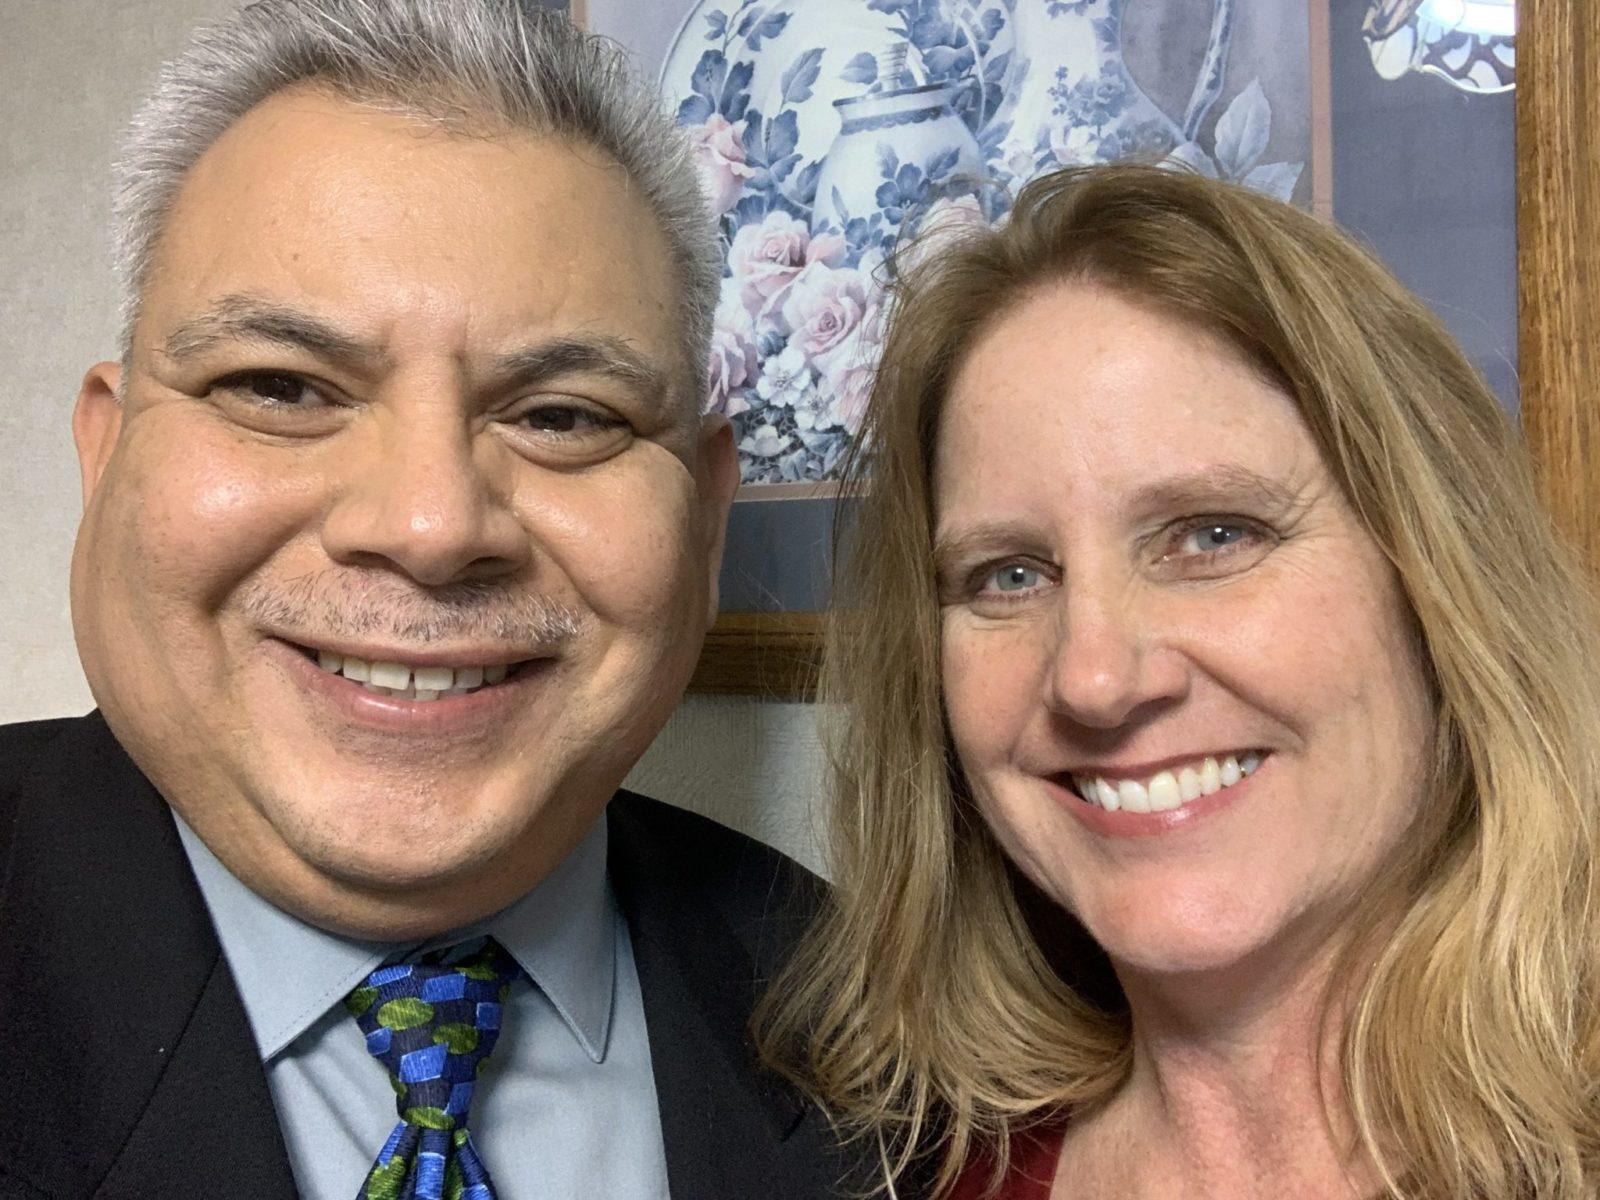 Rev. Colette (Smith '87) and Rev. Juan Carlos '88 Gonzalez